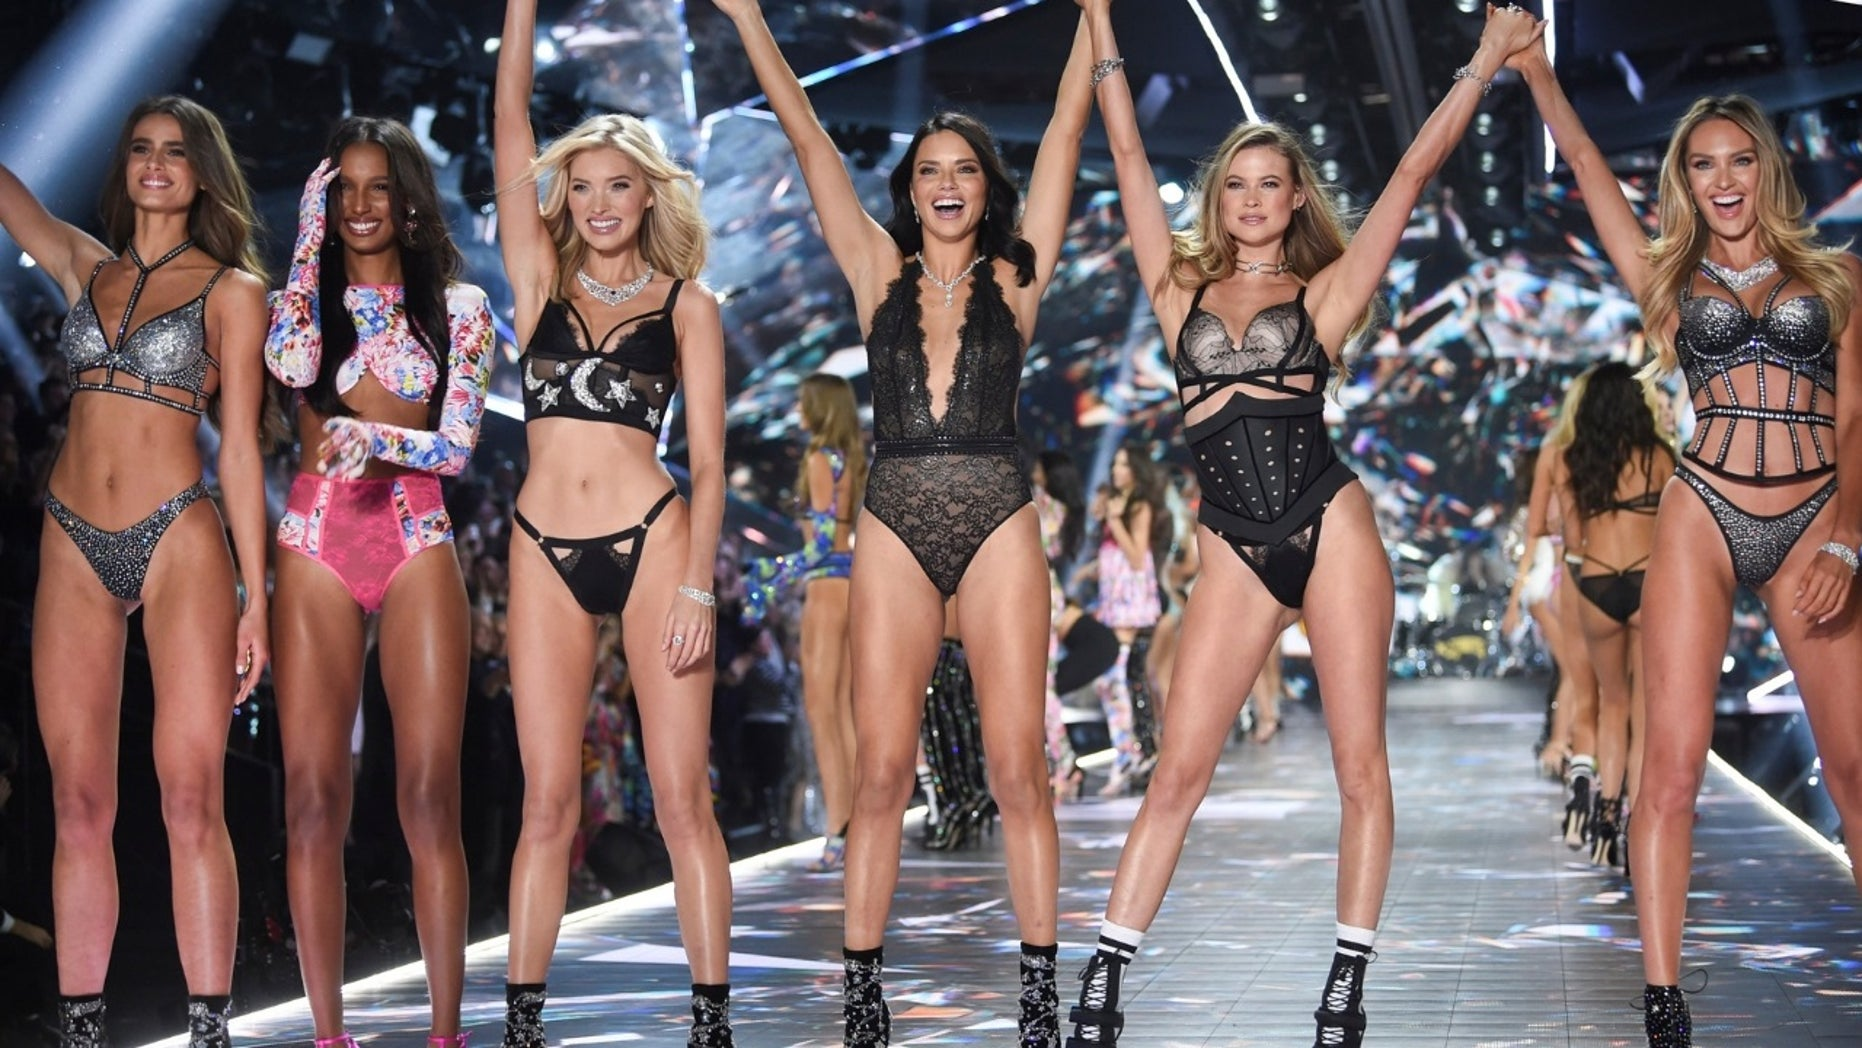 Victoria's Secret CMO apologized for his comments regarding transgender models.